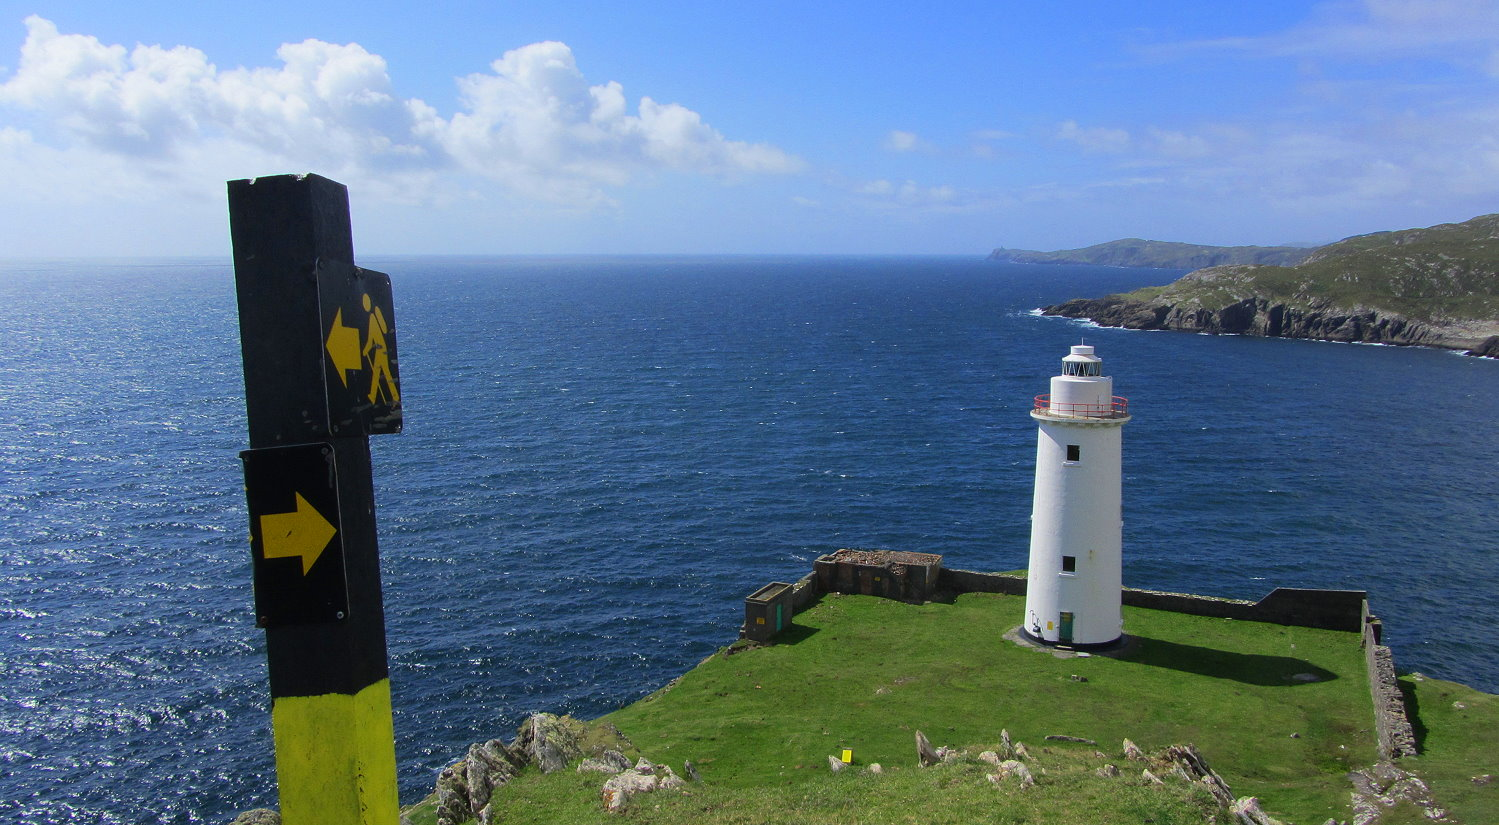 Wanderlust Irland Inselwandern Bere Island Leuchtturm